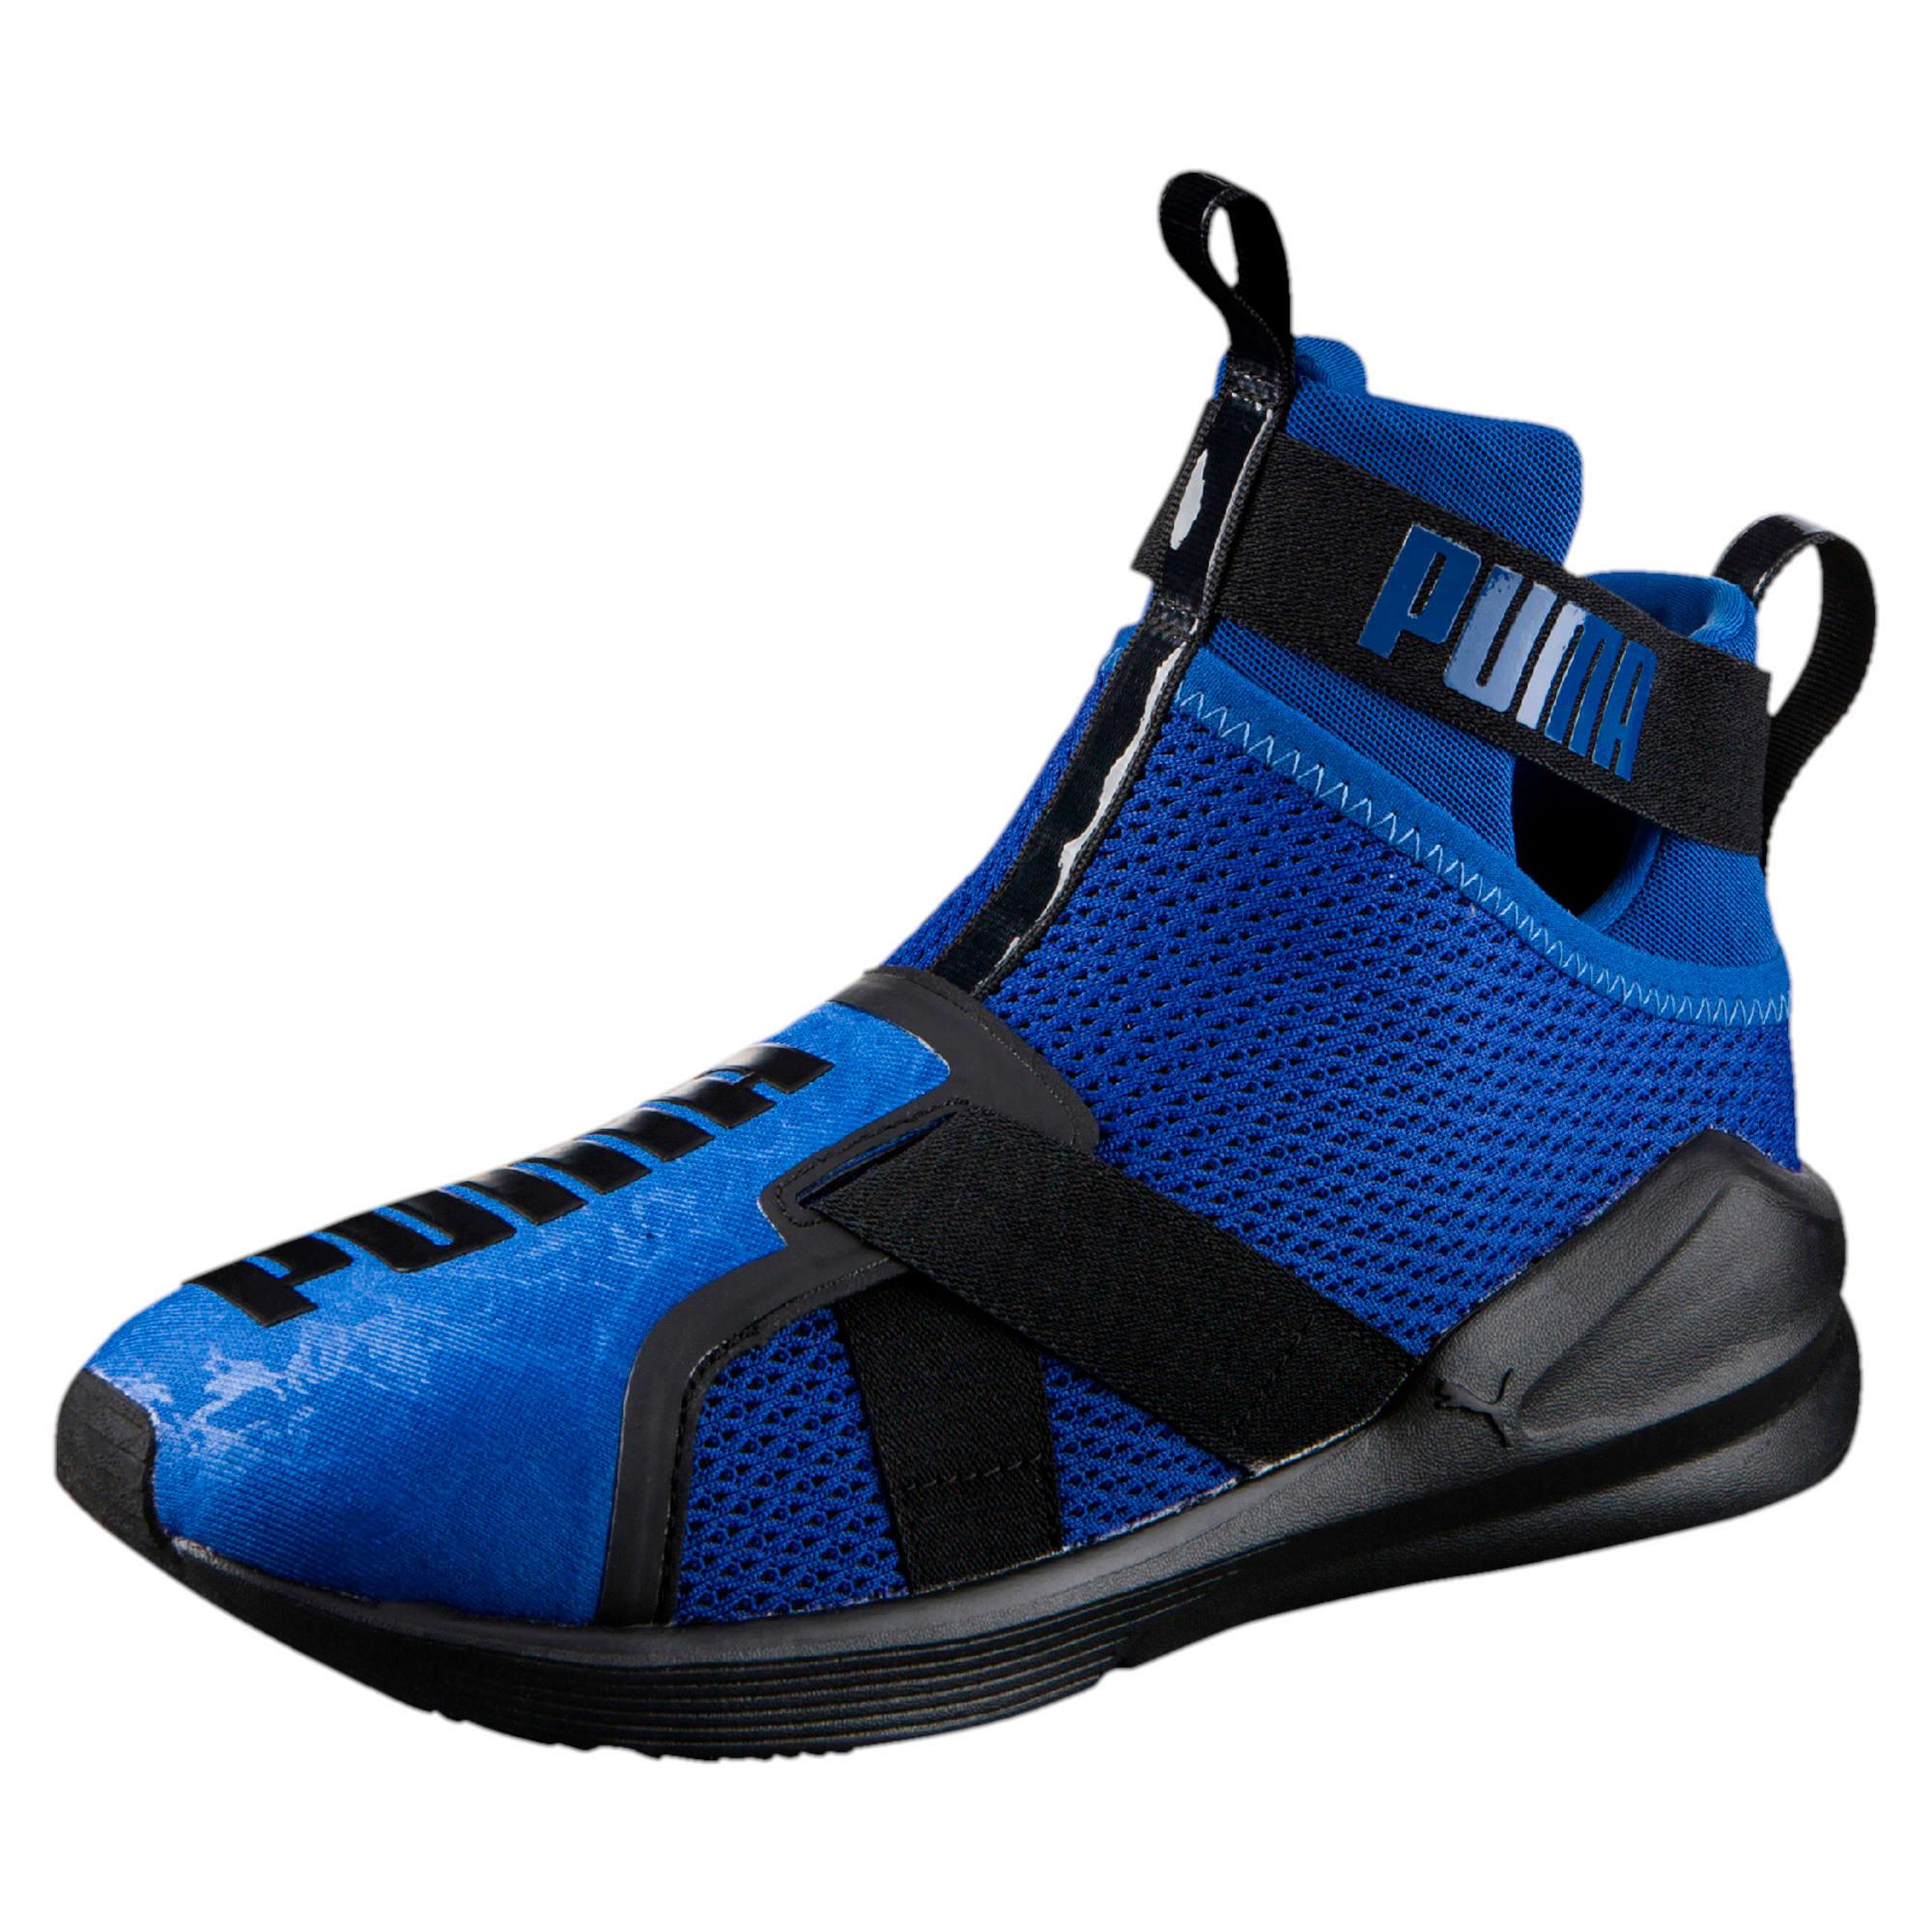 Thumbnail 1 of PUMA Fierce Strap Training Shoes, TRUE BLUE-Puma Black, medium-IND